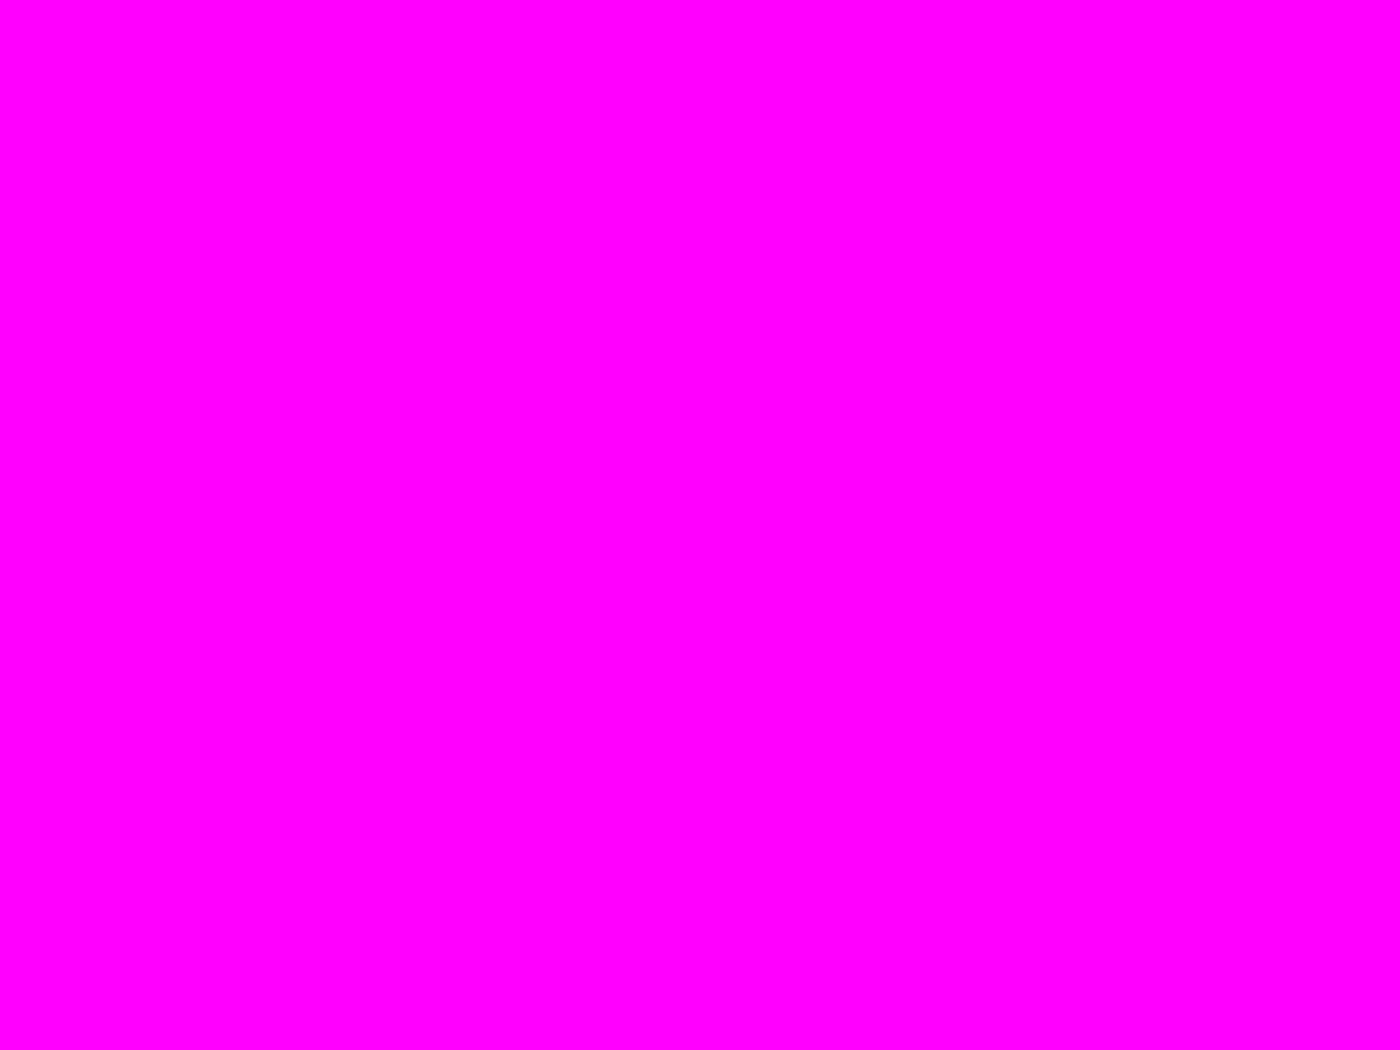 1400x1050 Fuchsia Solid Color Background